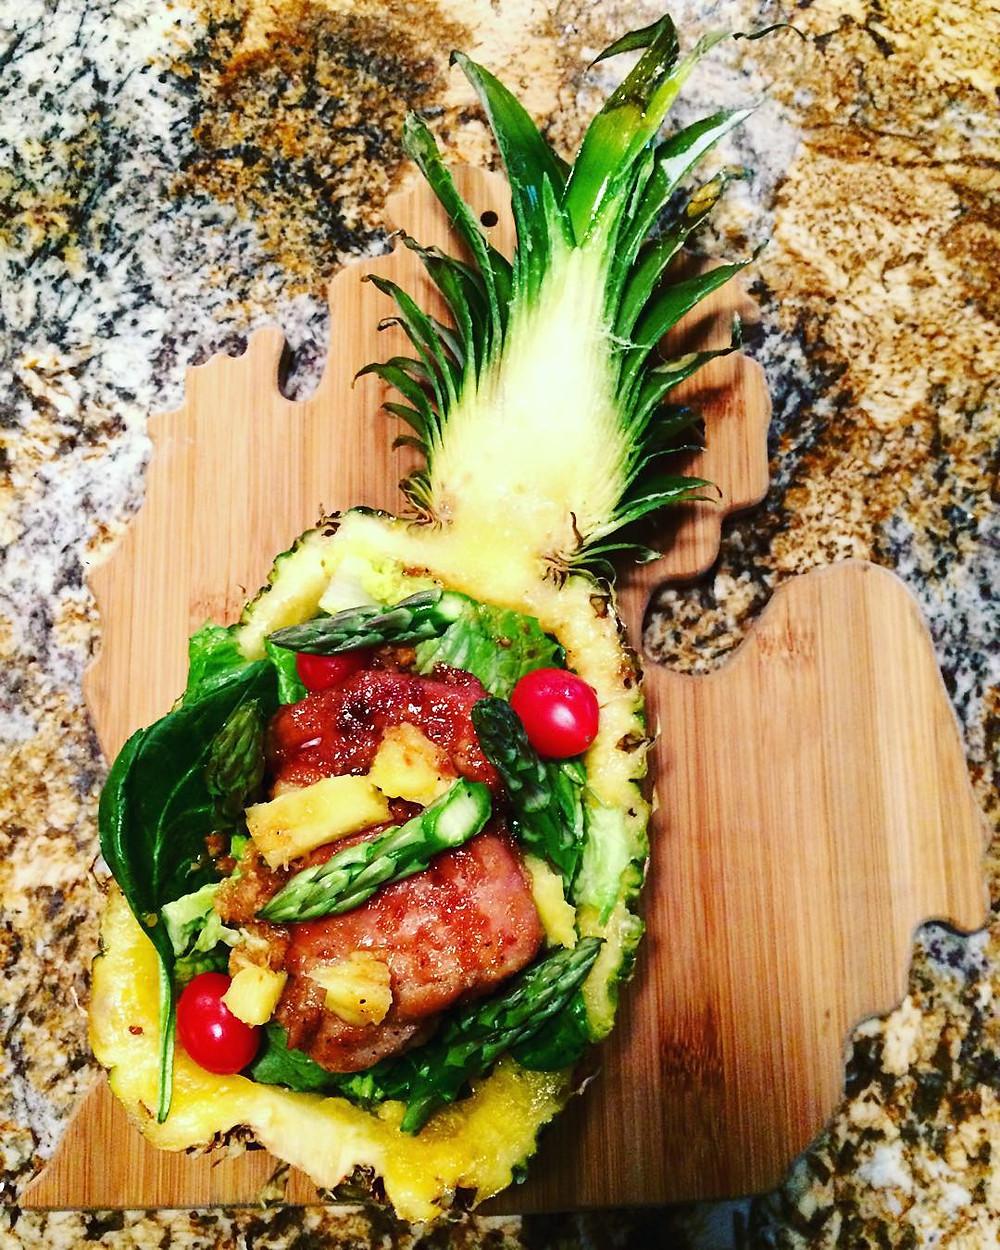 Teriyaki Chicken Pineapple Bowl - Nom News